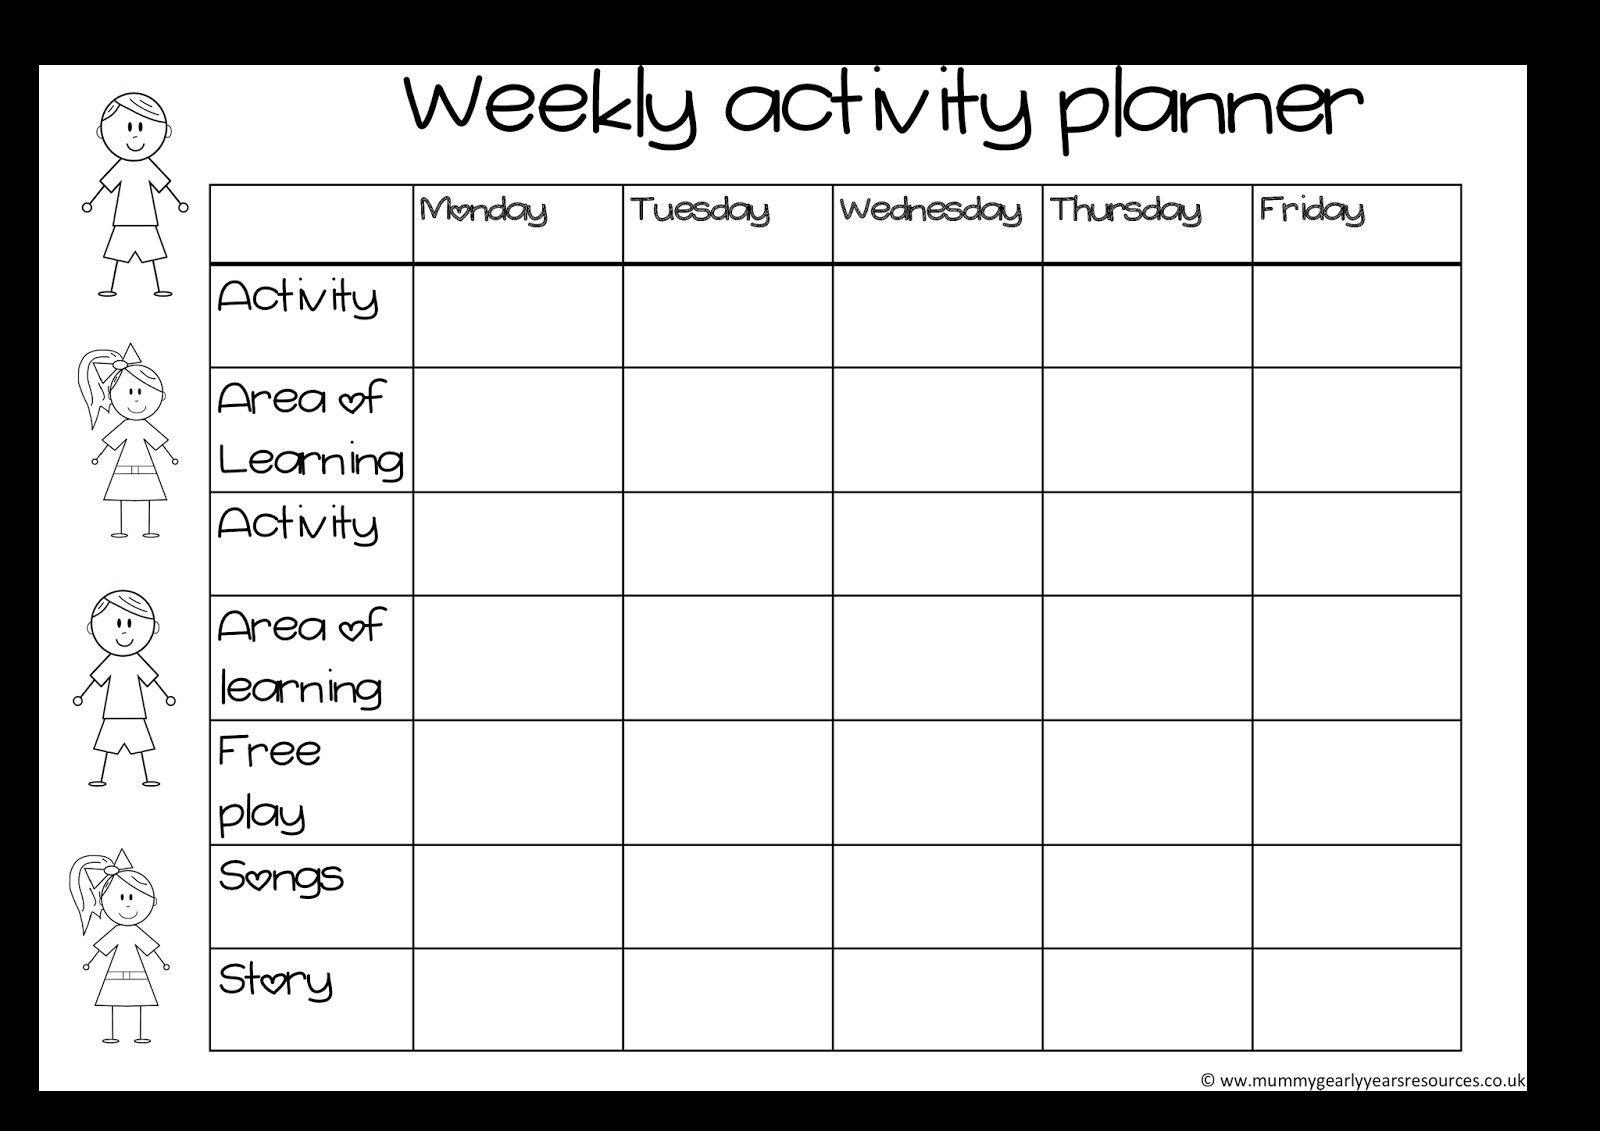 Blank Activity Calendar Template 28 Templates Also With Pertaining To Blank Activity Calendar Template